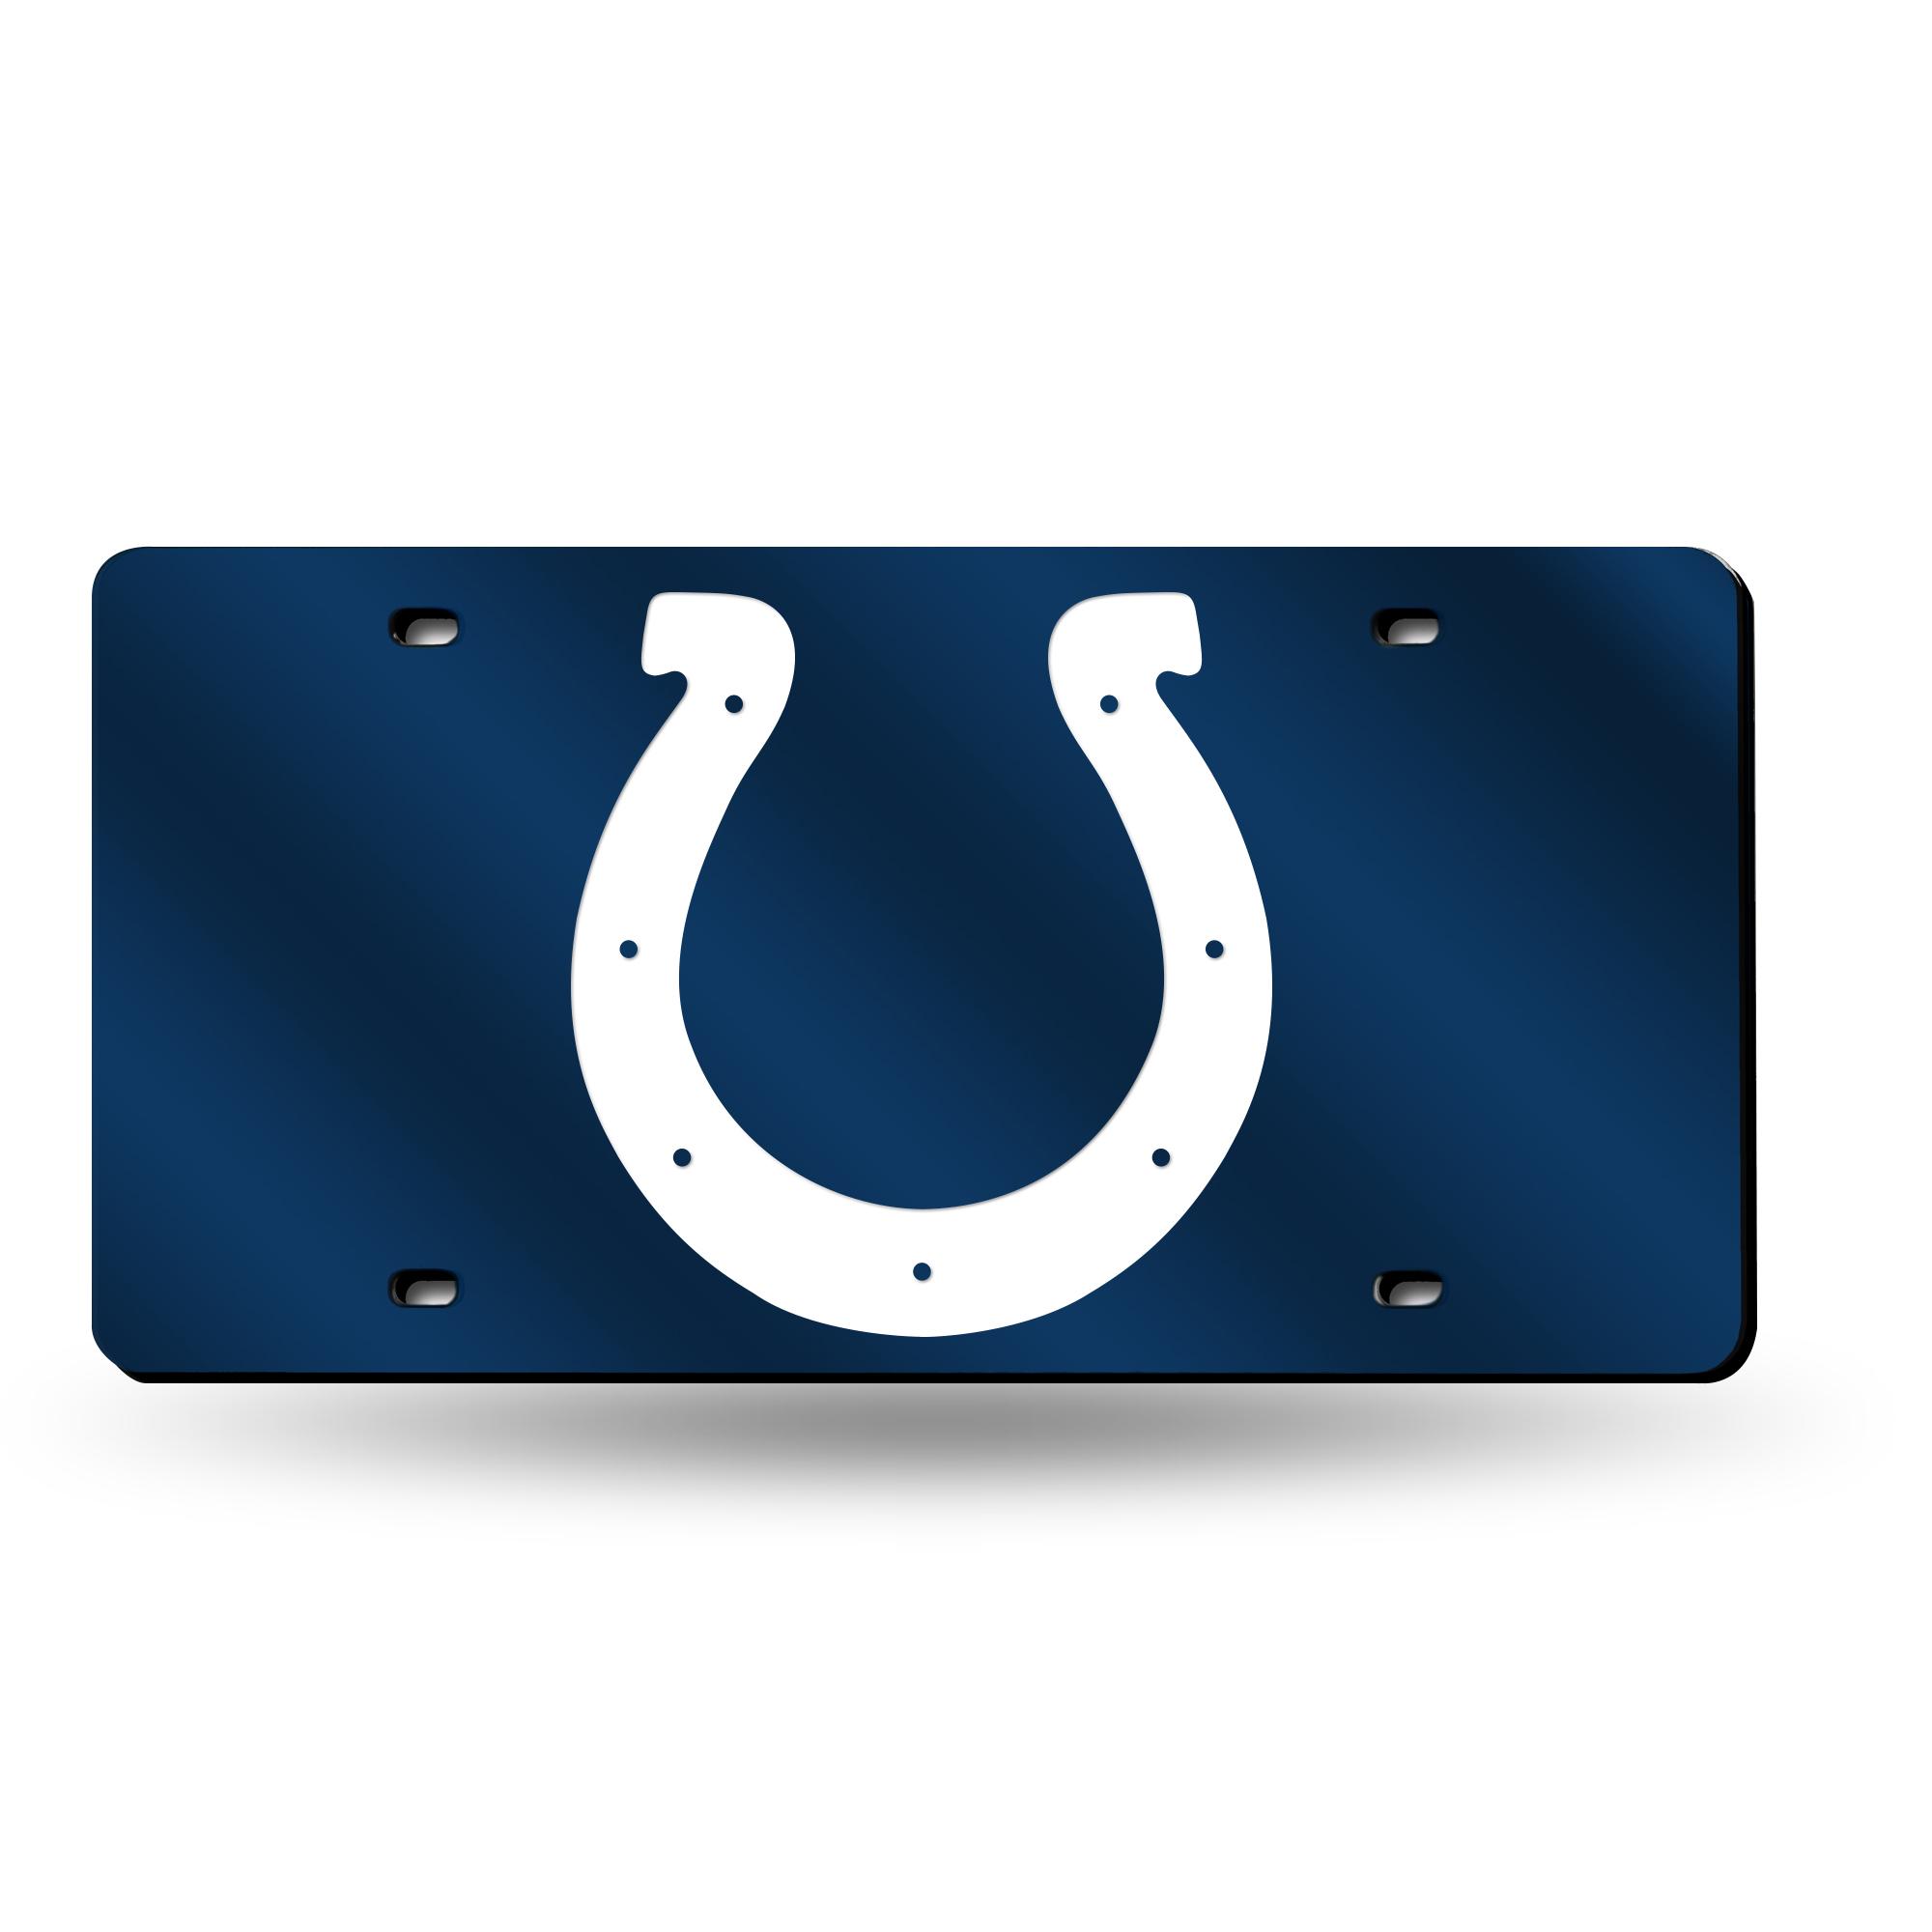 NFL License Plates